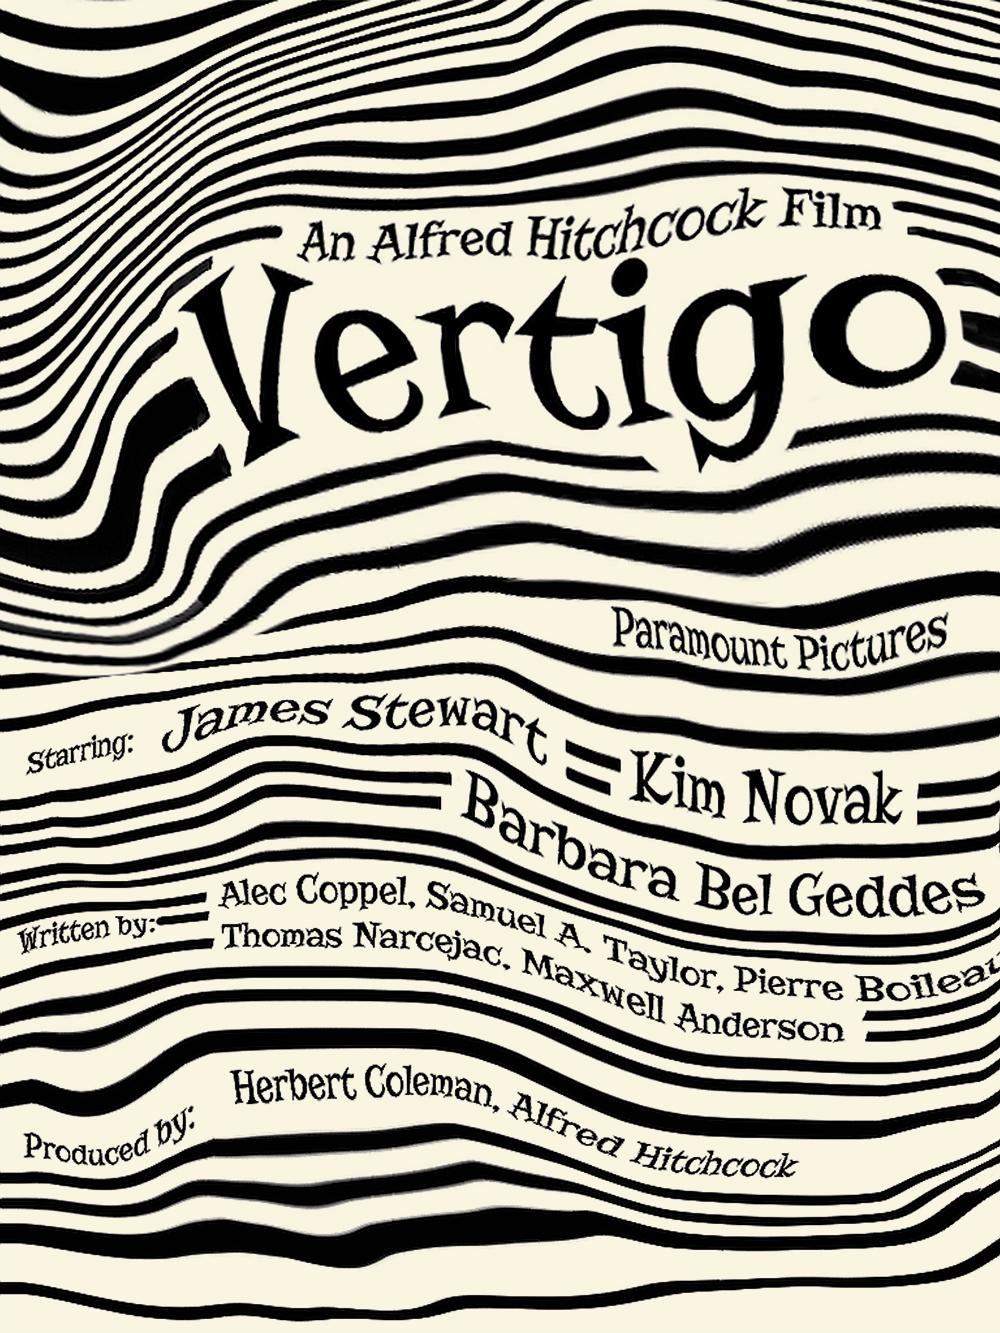 vertigo-2.jpg